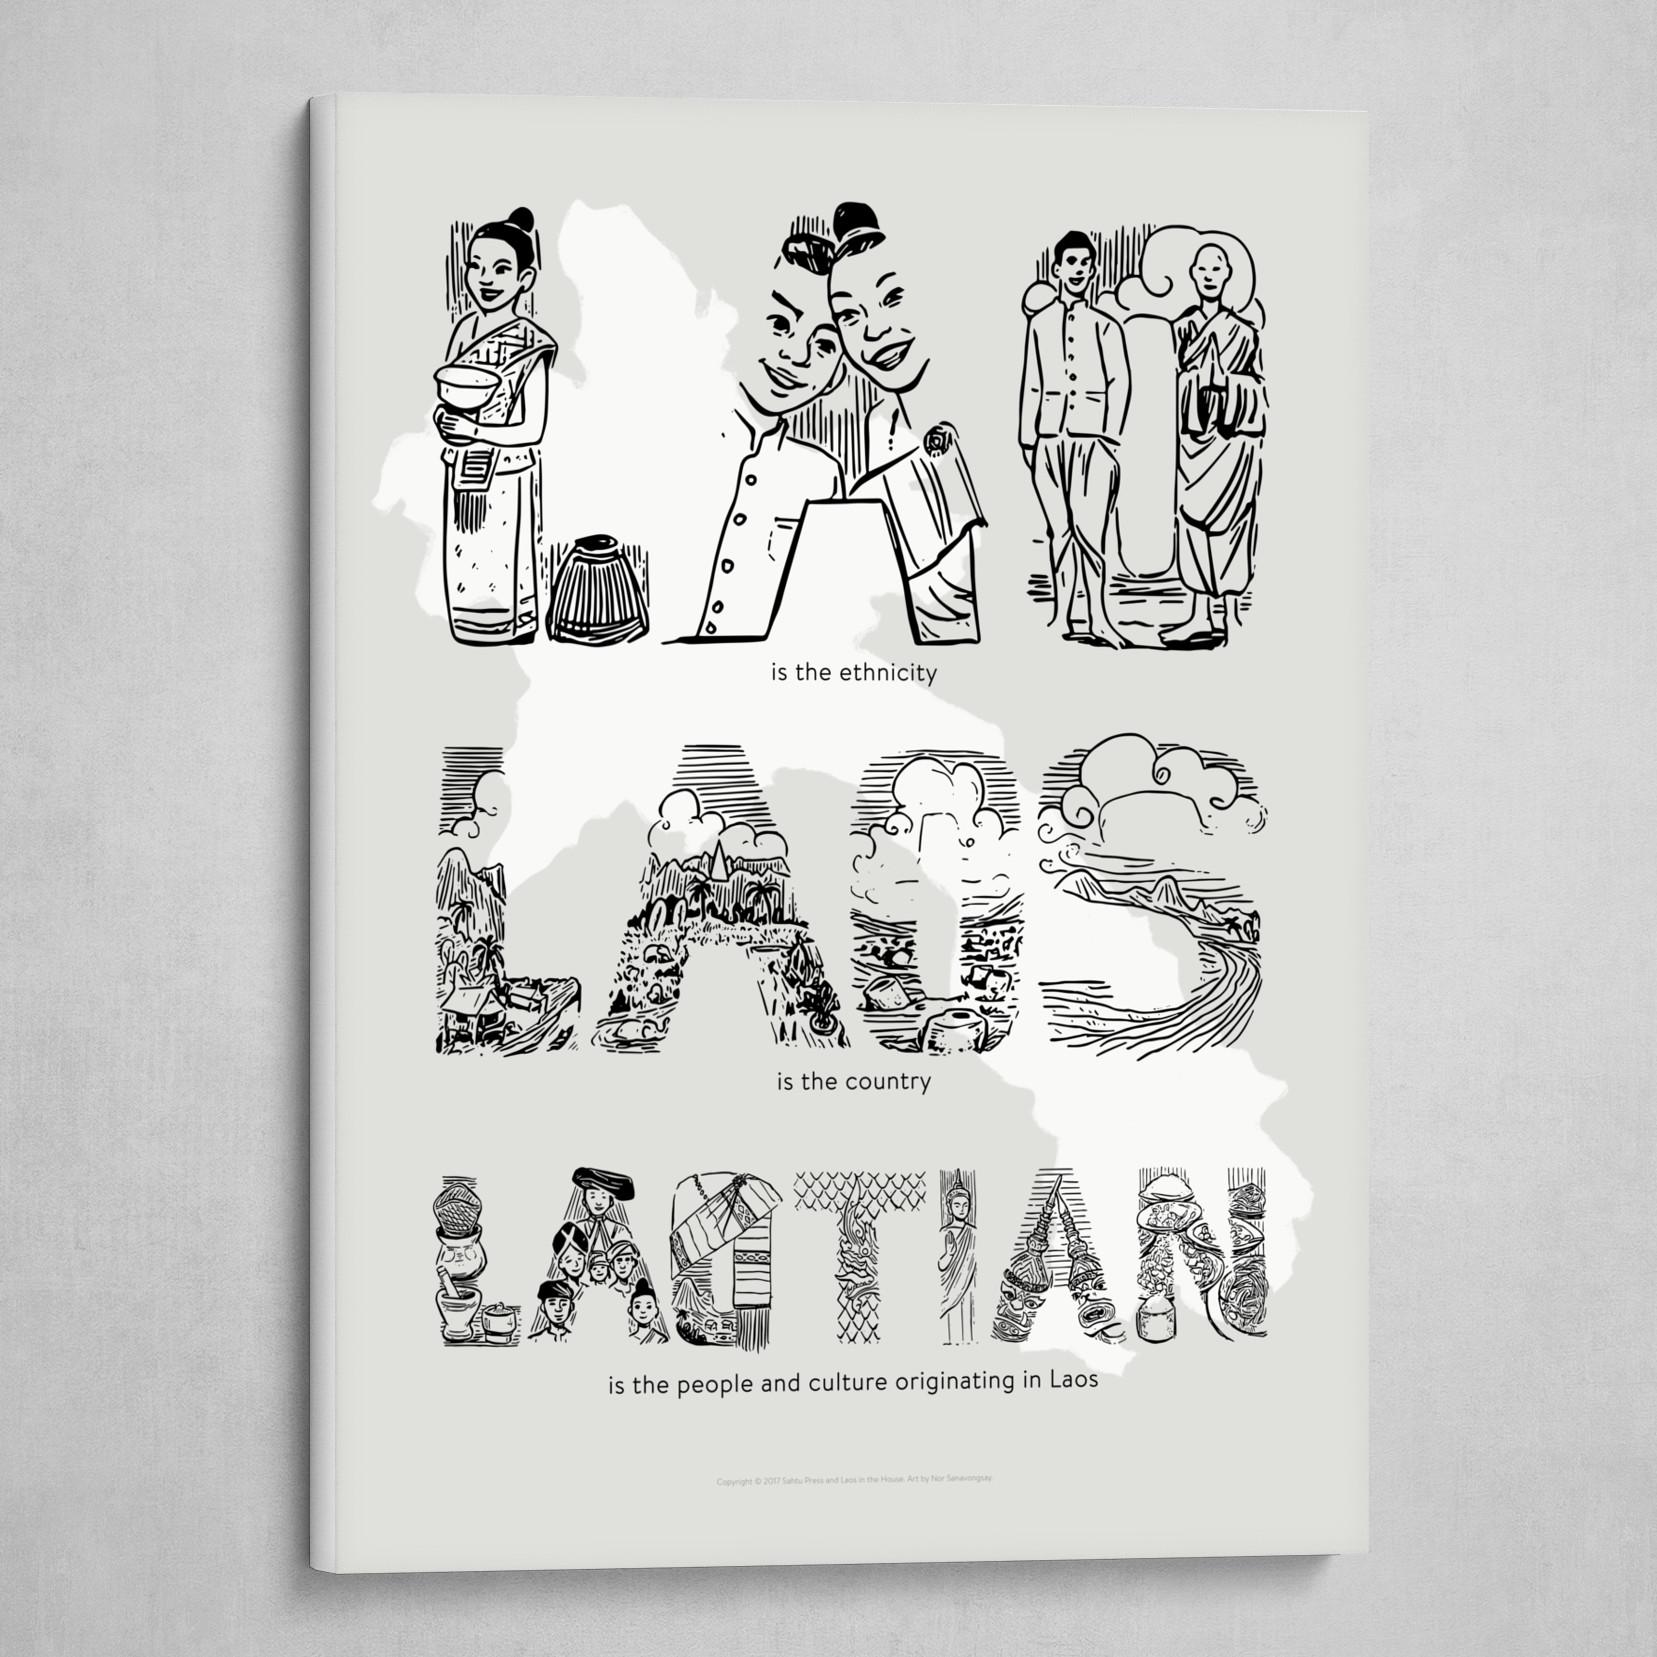 Lao, Laos, Laotian